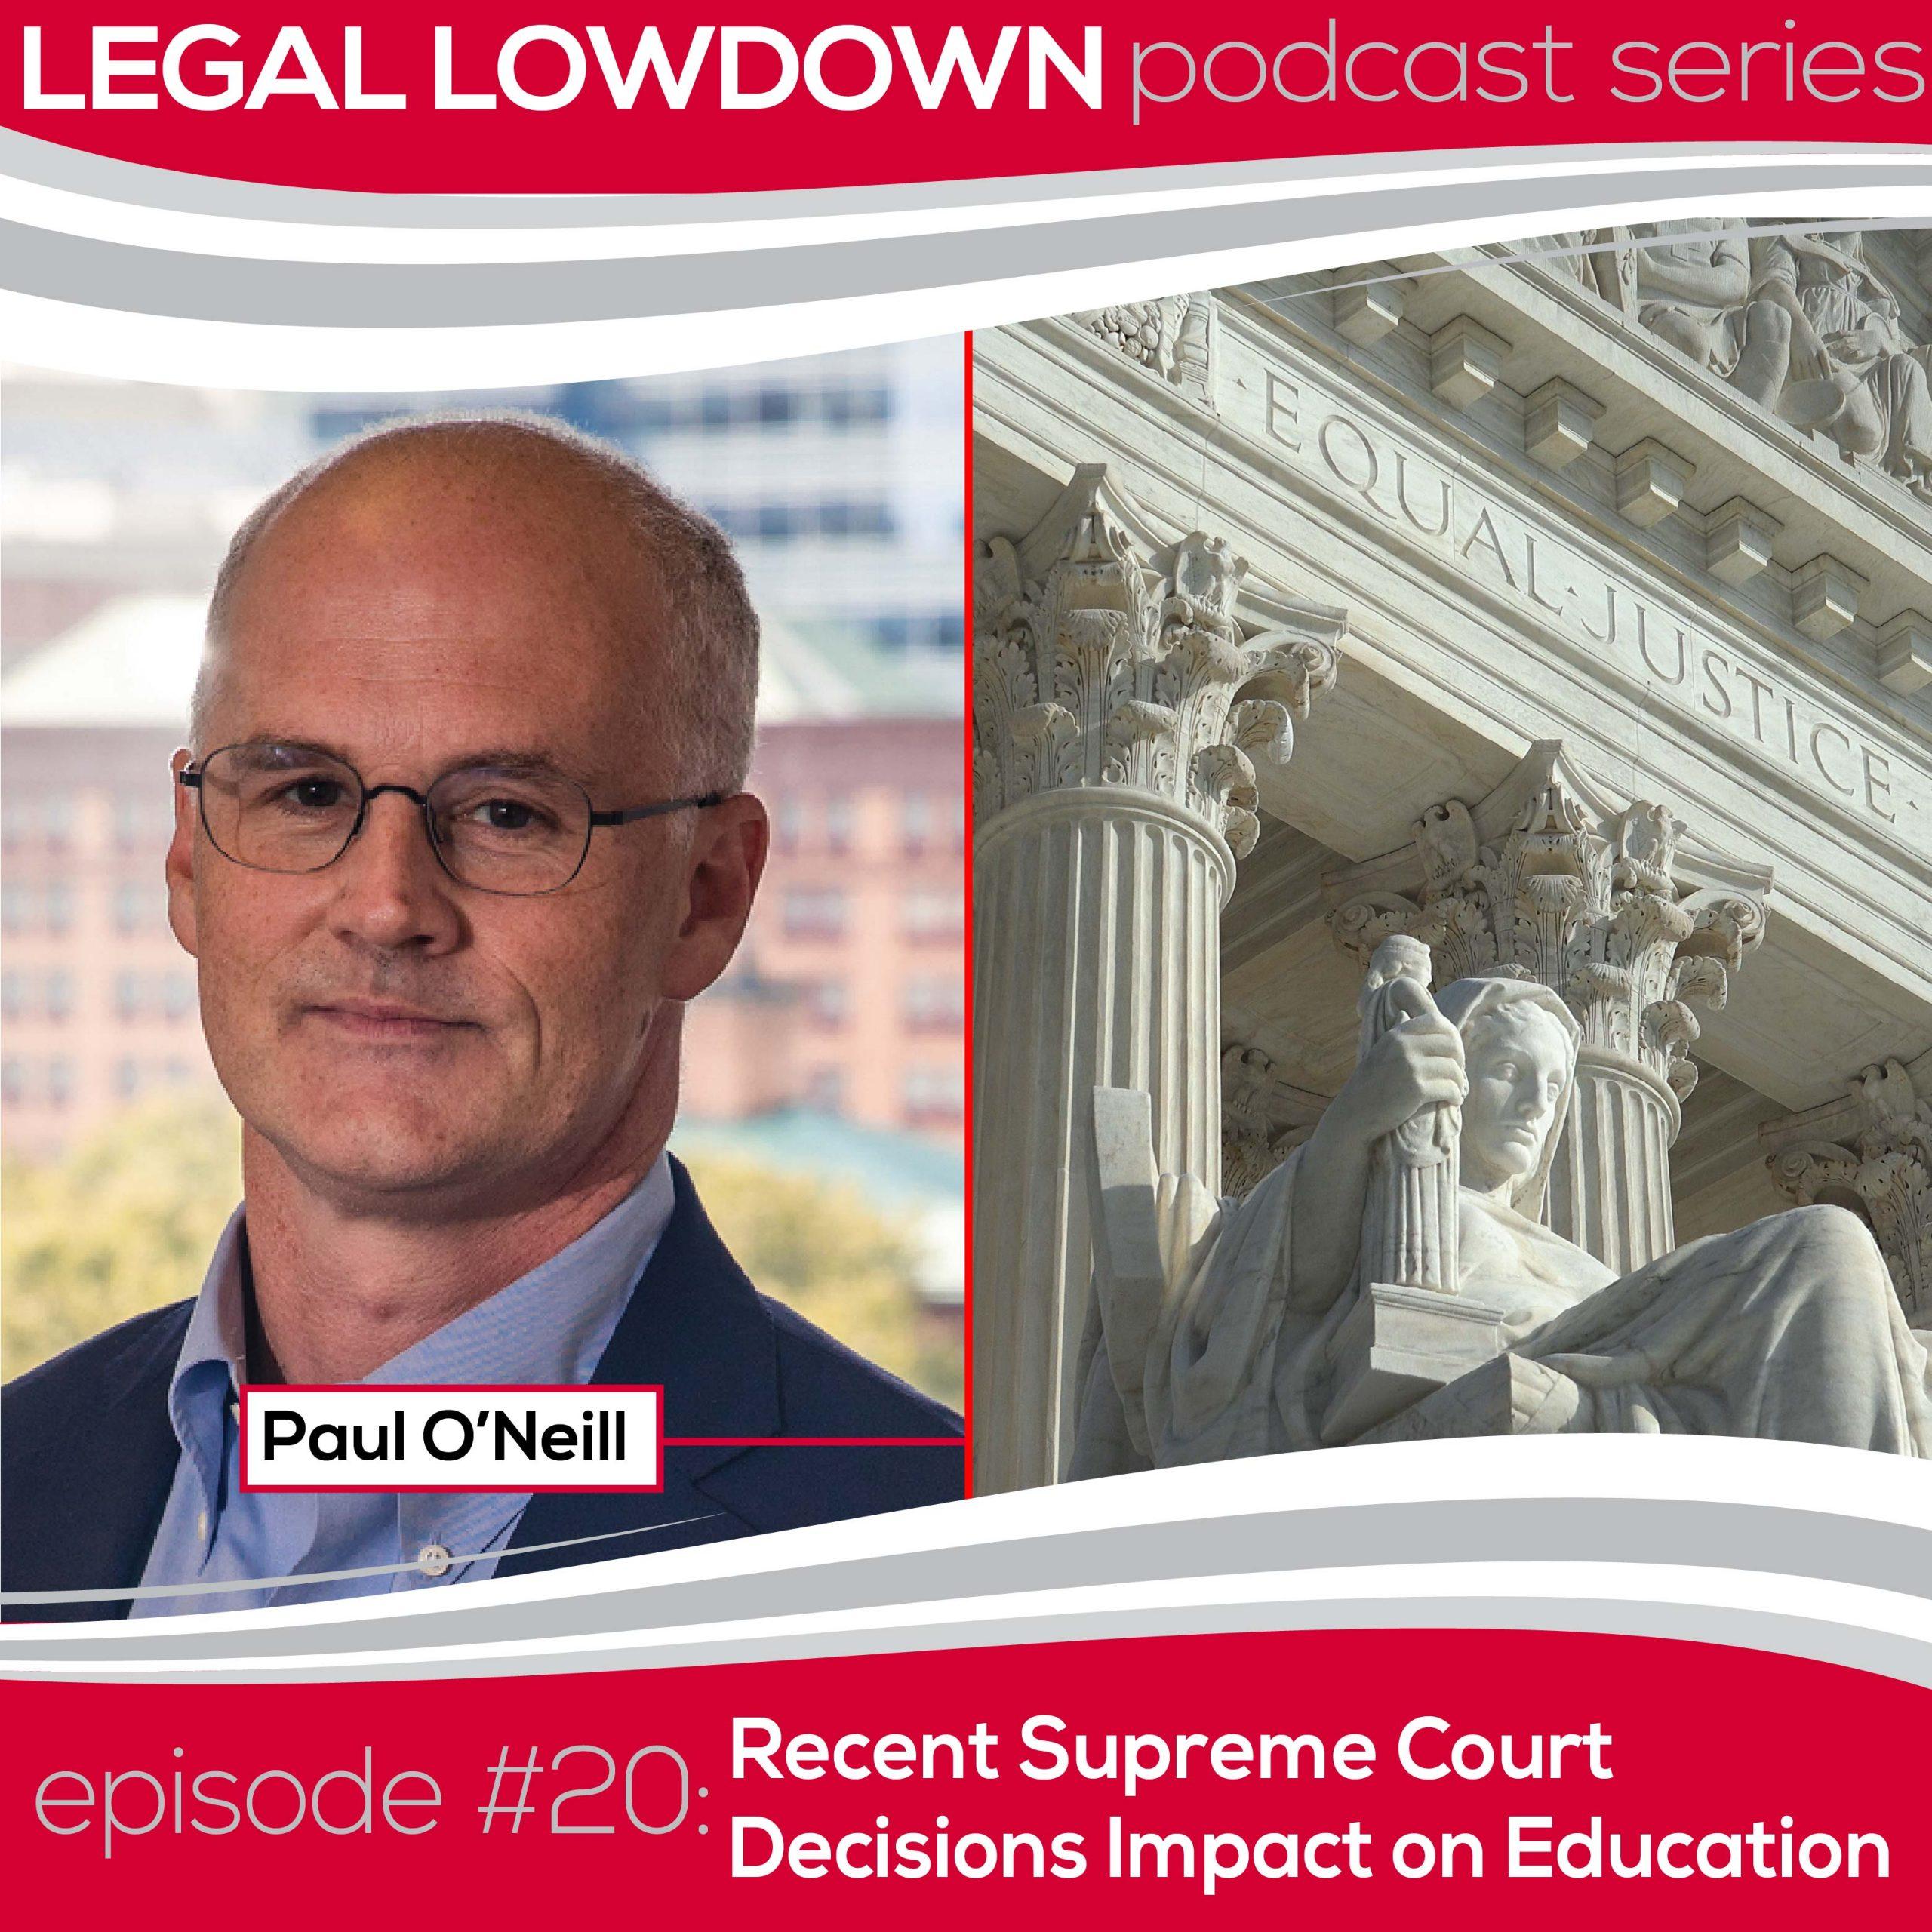 Legal Lowdown Podcast – Episode #20 – Recent Supreme Court Decisions Impact on Education